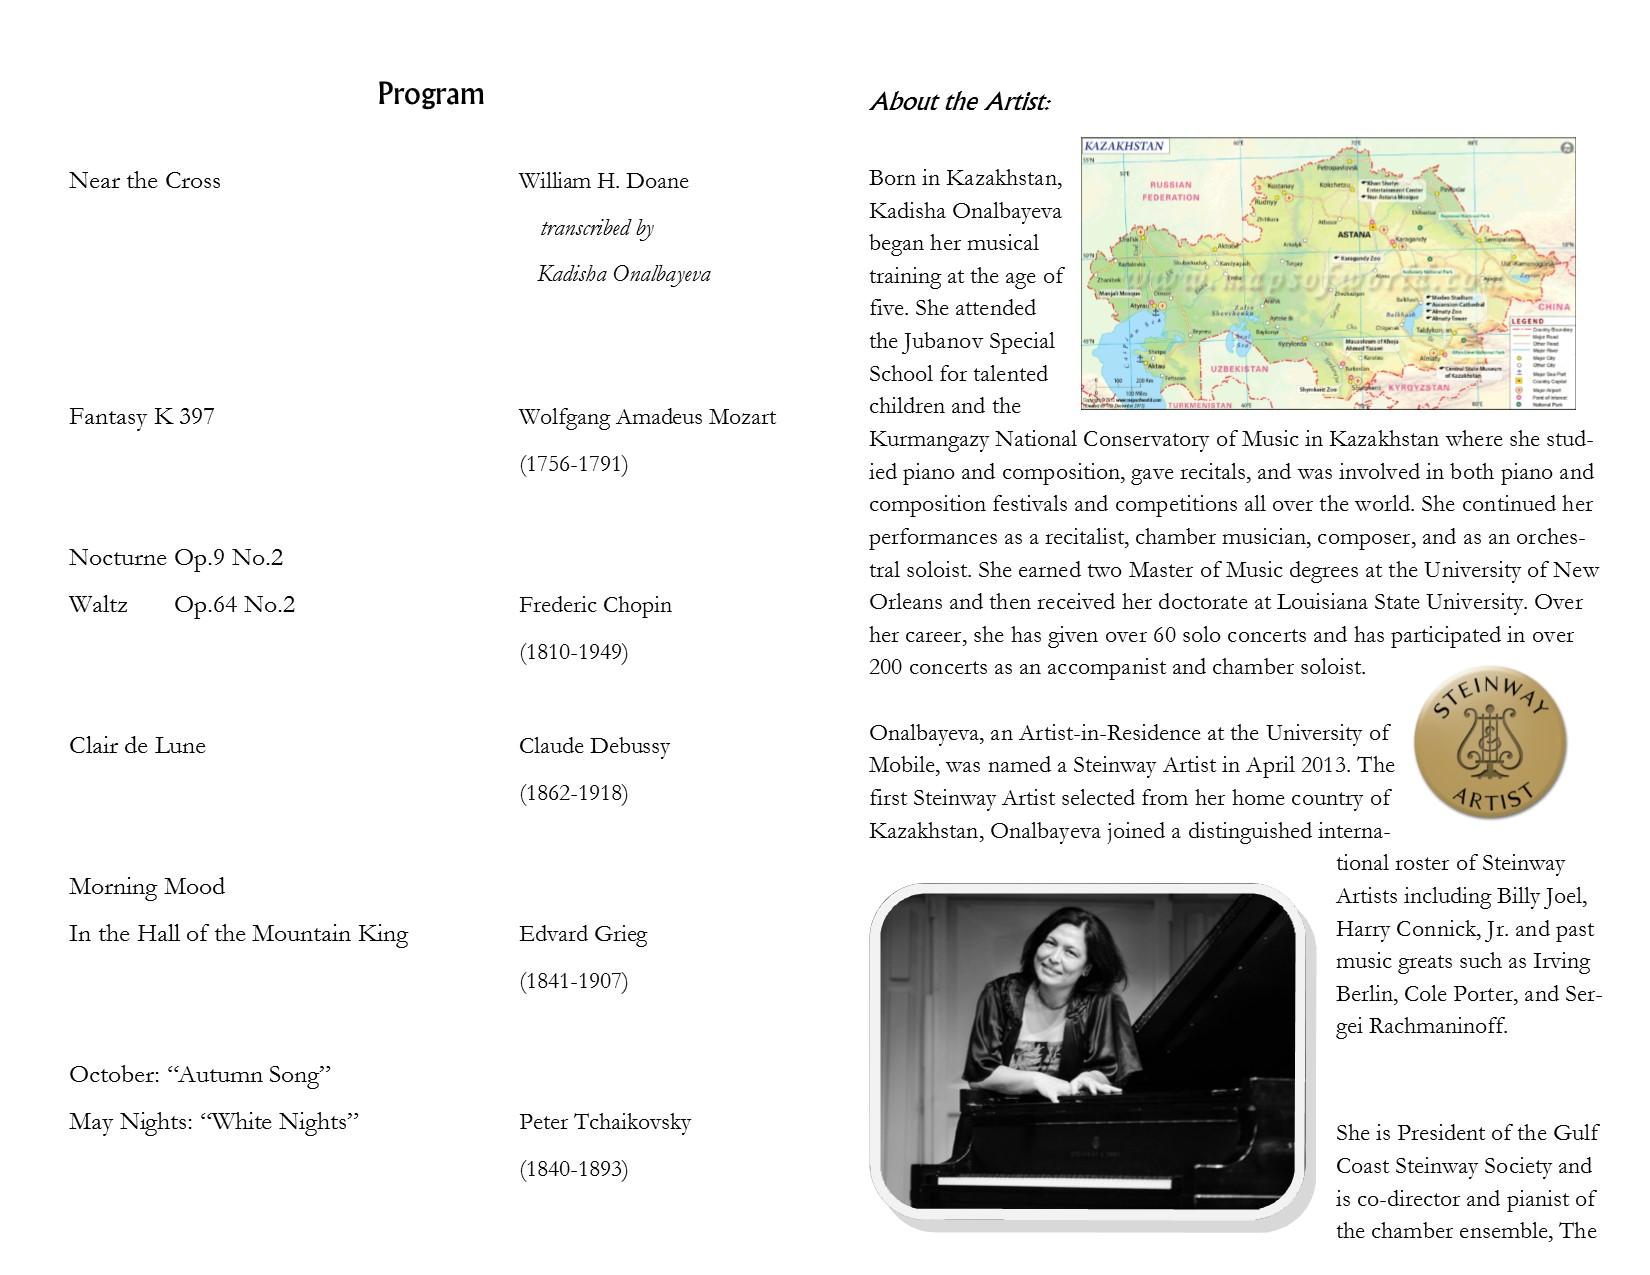 Program-Concert by Kadisha Onalbayeva 2.jpg